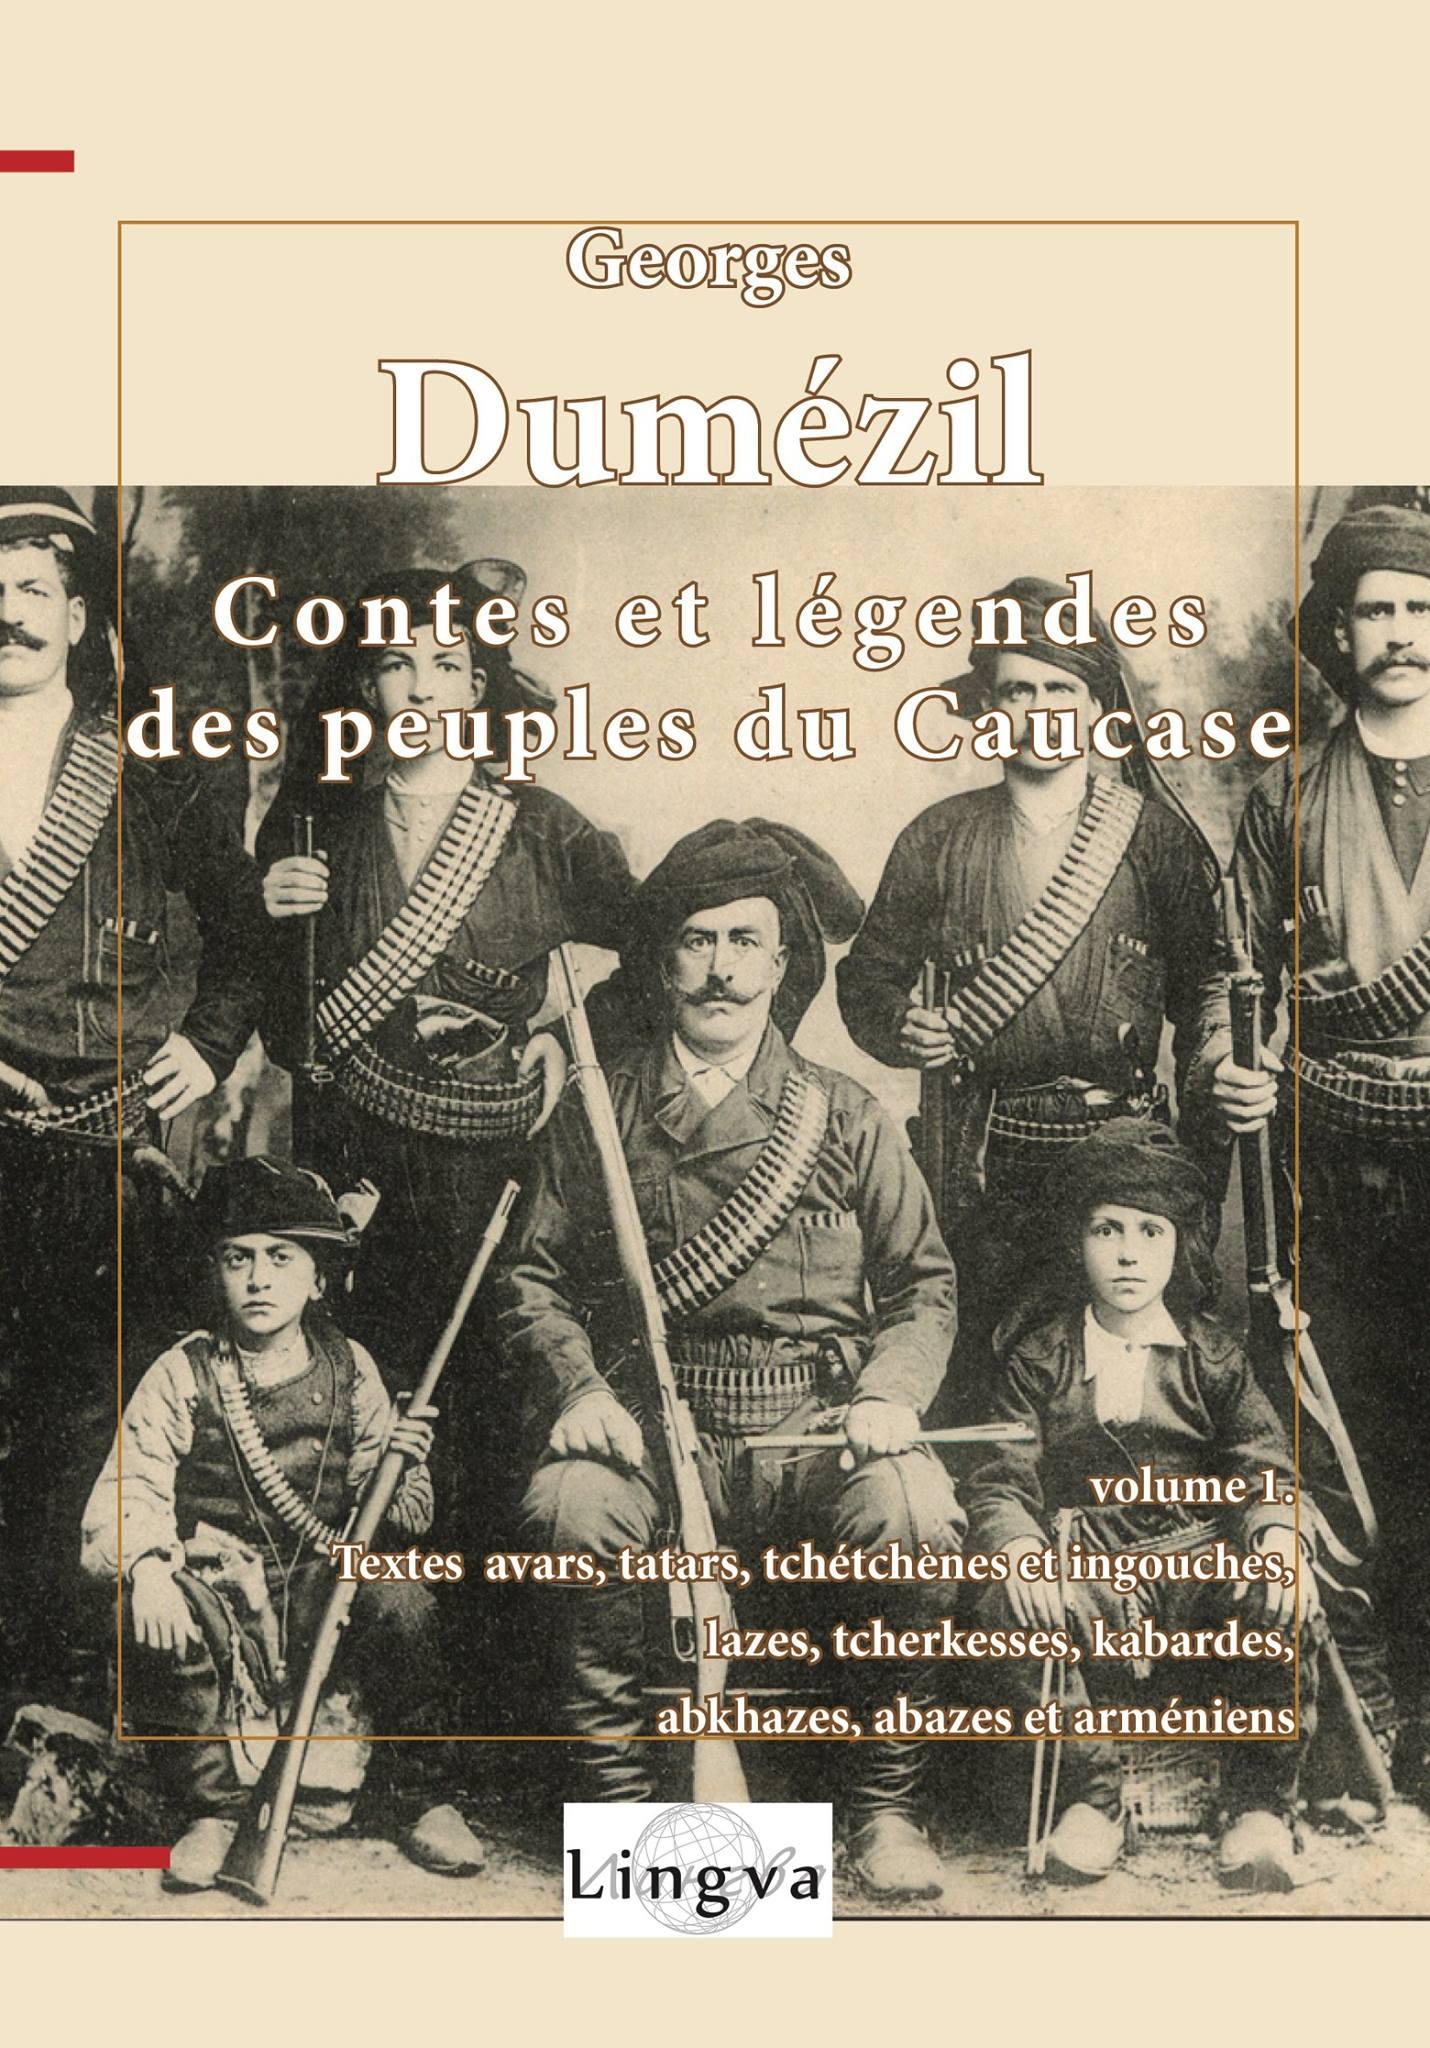 http://www.lingva.fr/wp-content/uploads/2017/08/Dumézil.jpg